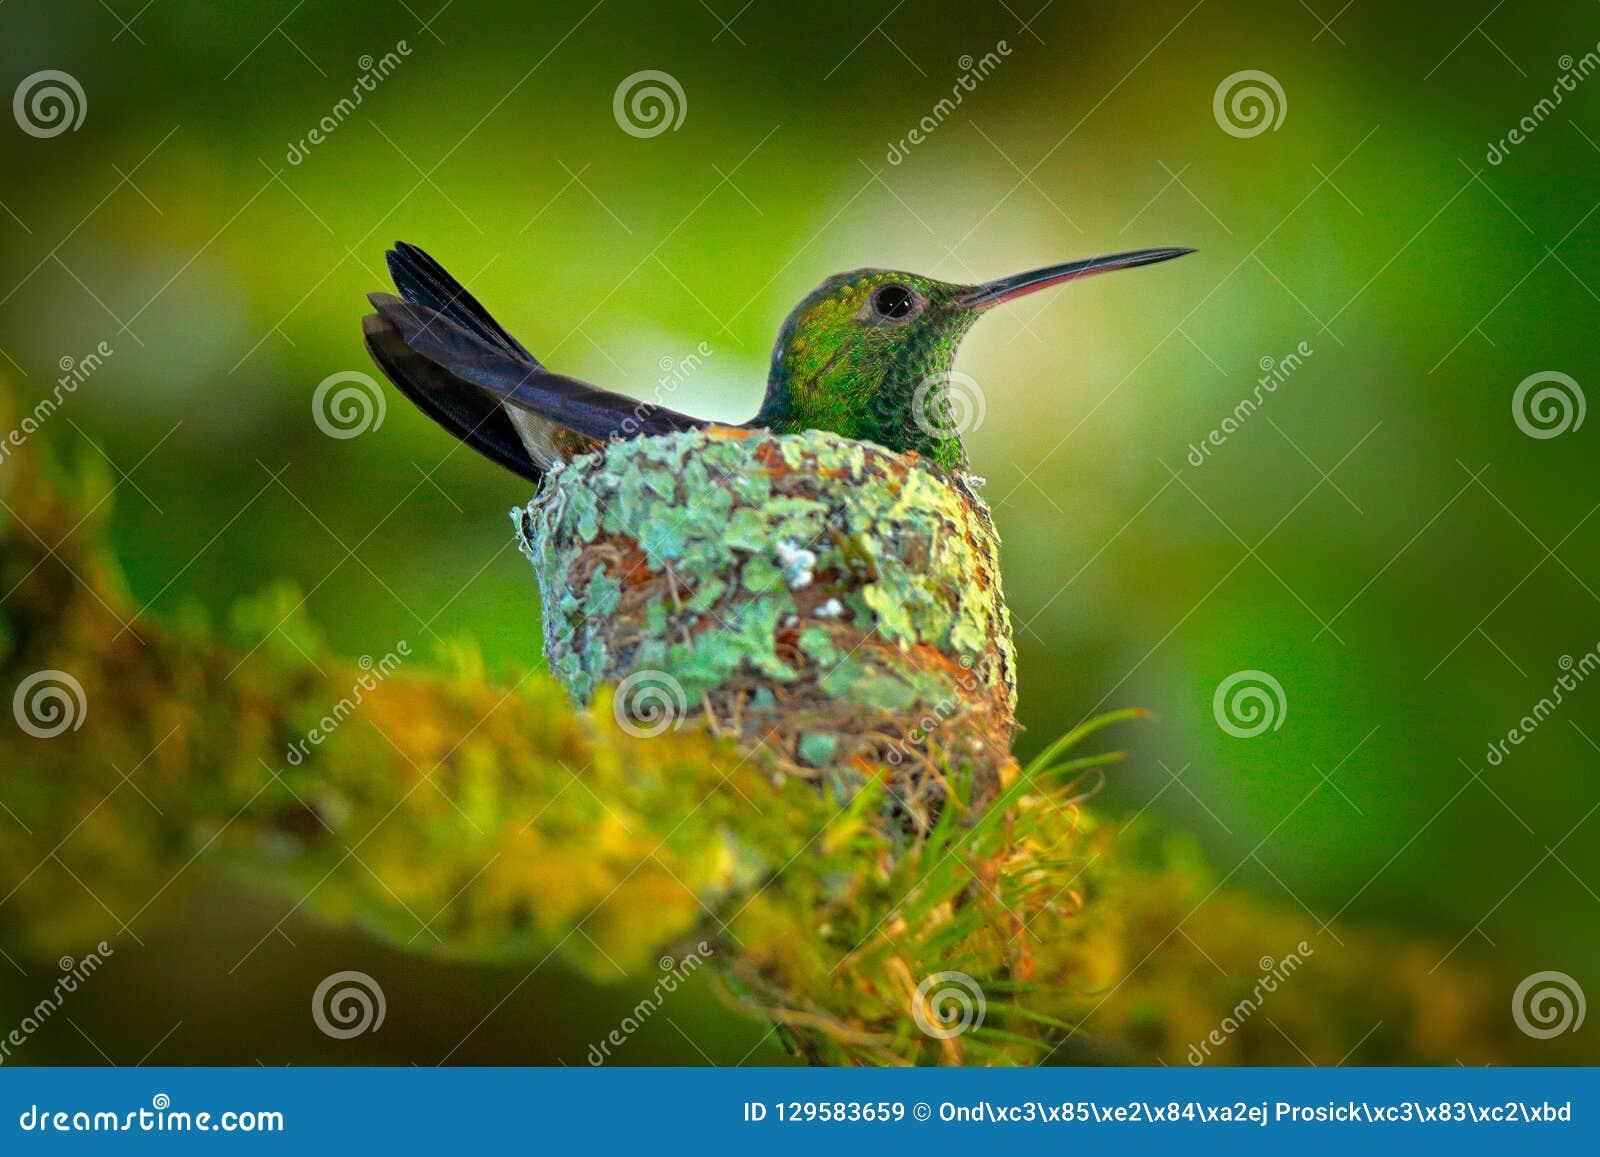 Hummingbird sitting on the eggs in the nest, Trinidad and Tobago. Copper-rumped Hummingbird, Amazilia tobaci, on the tree, wildlif